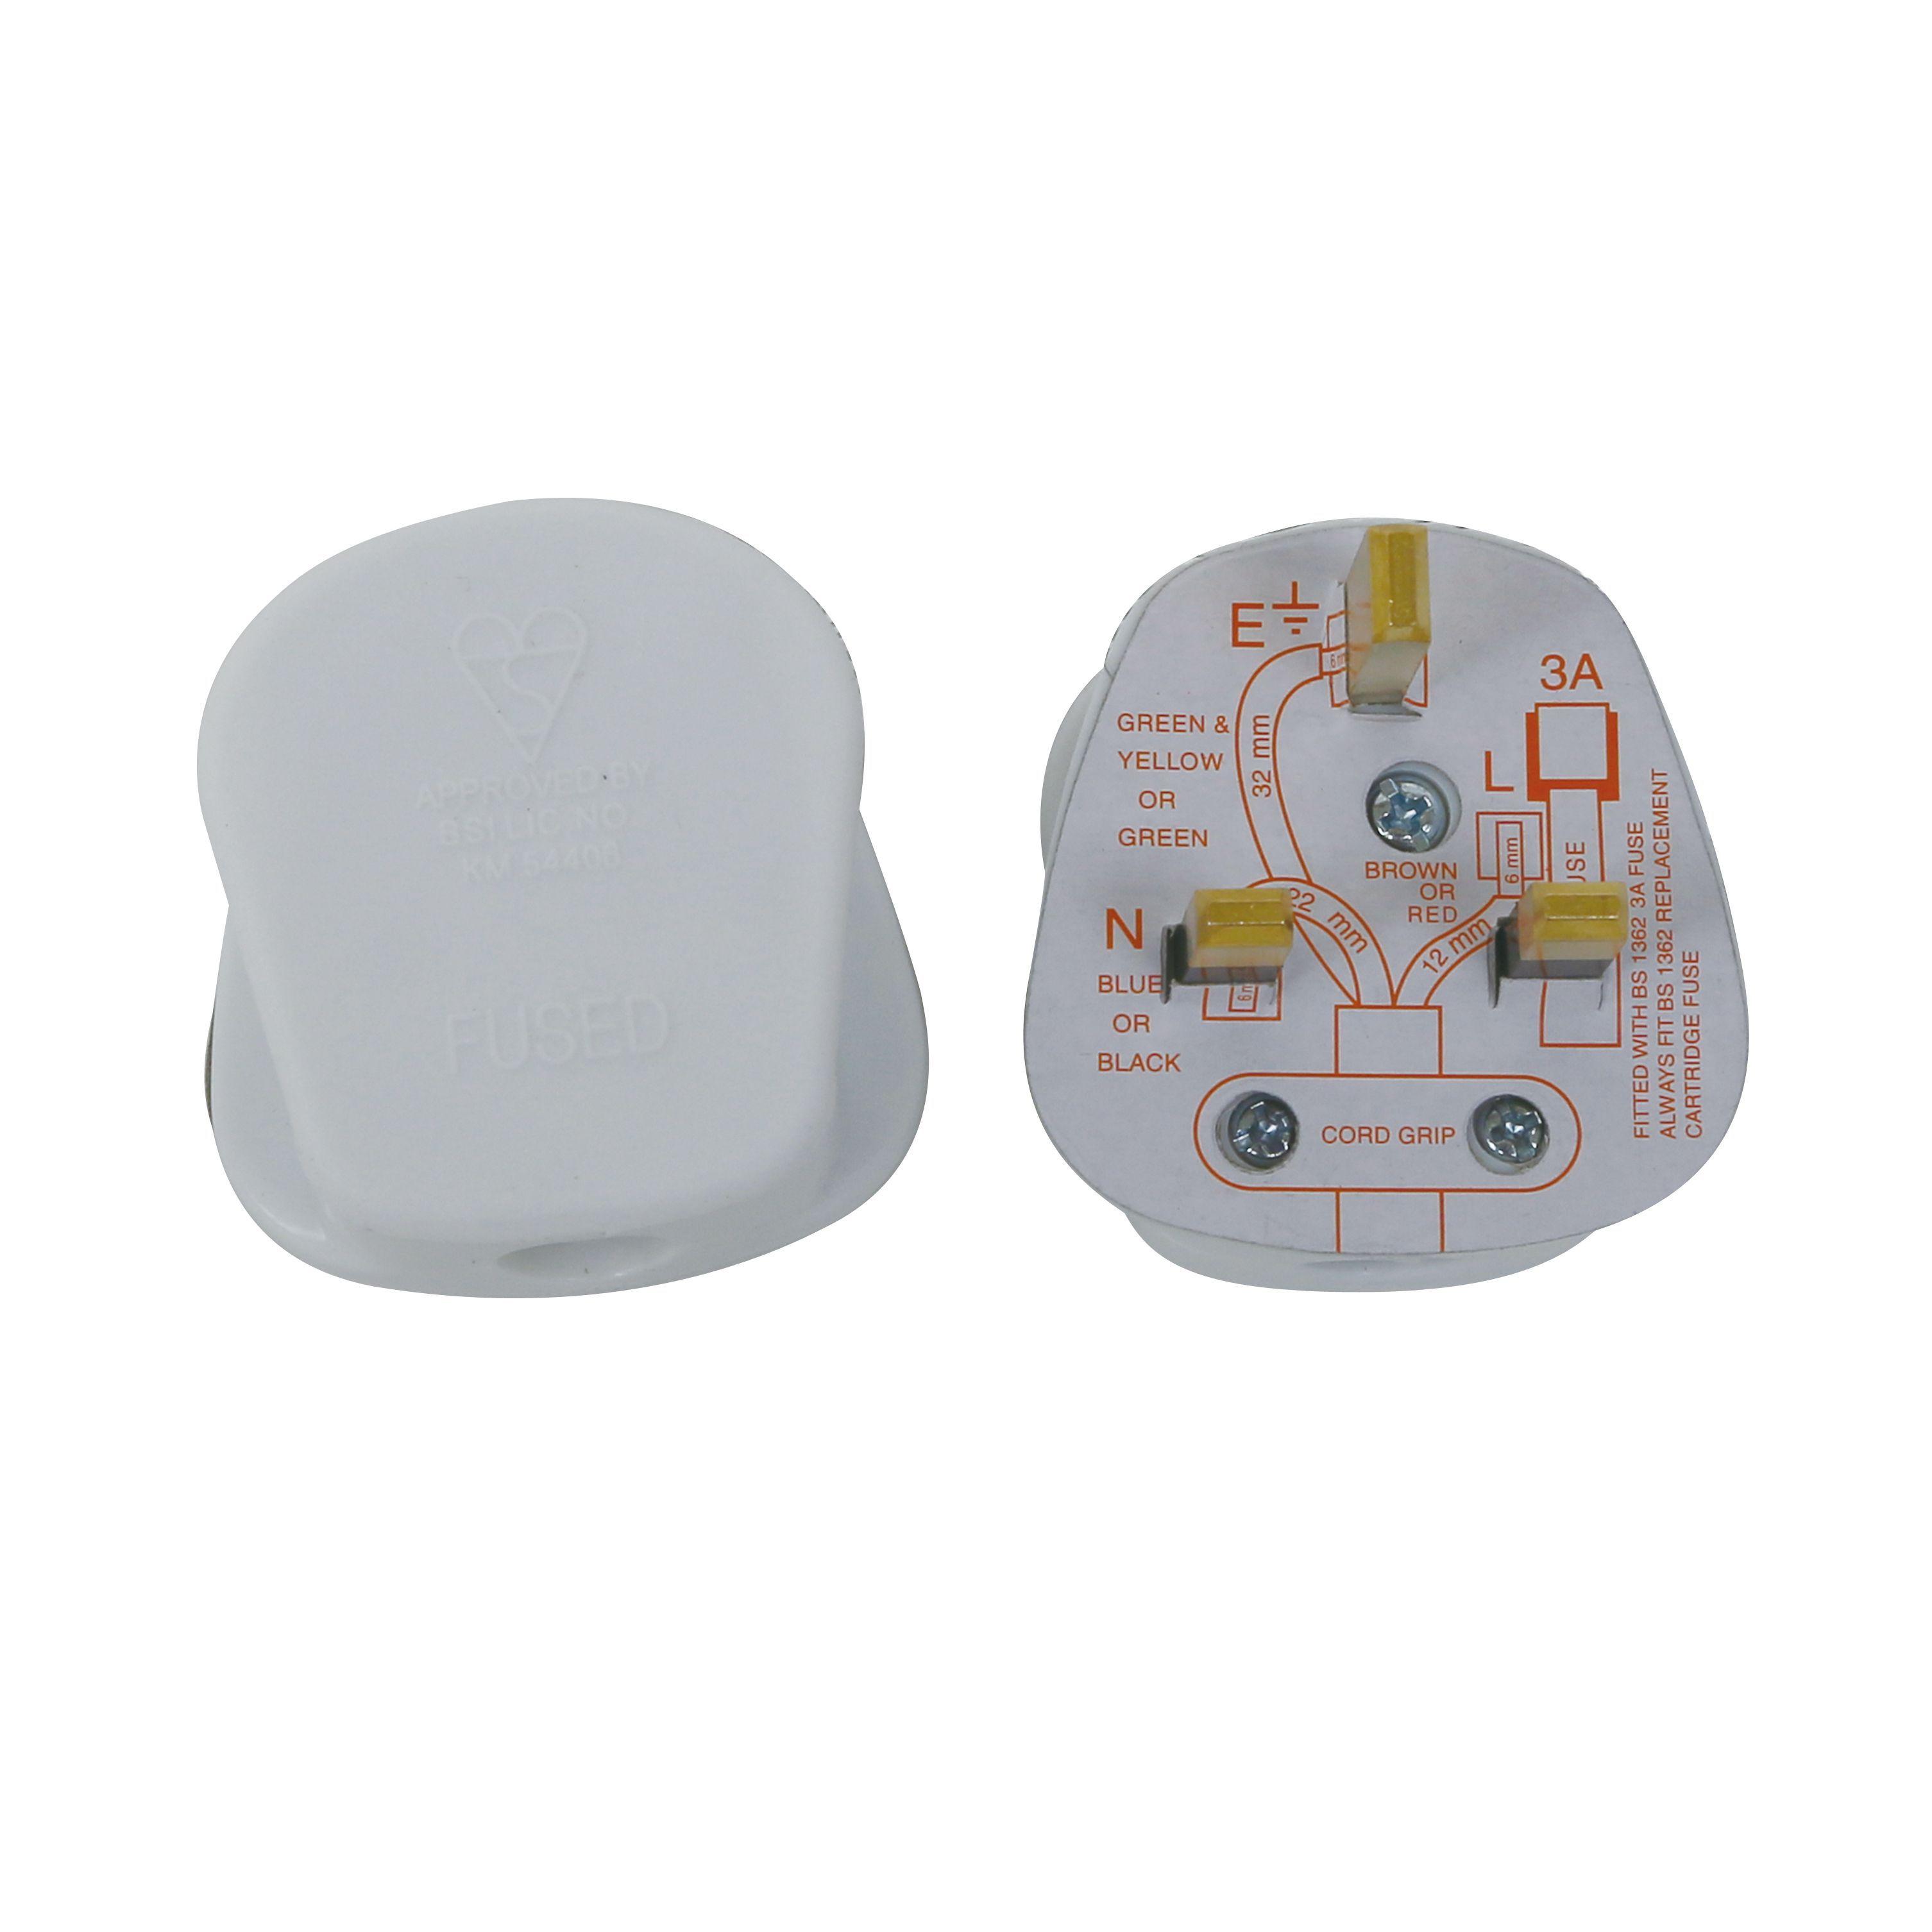 5052931364862_01c plugs, fuses & connectors diy equipment b&q fuse box at eliteediting.co